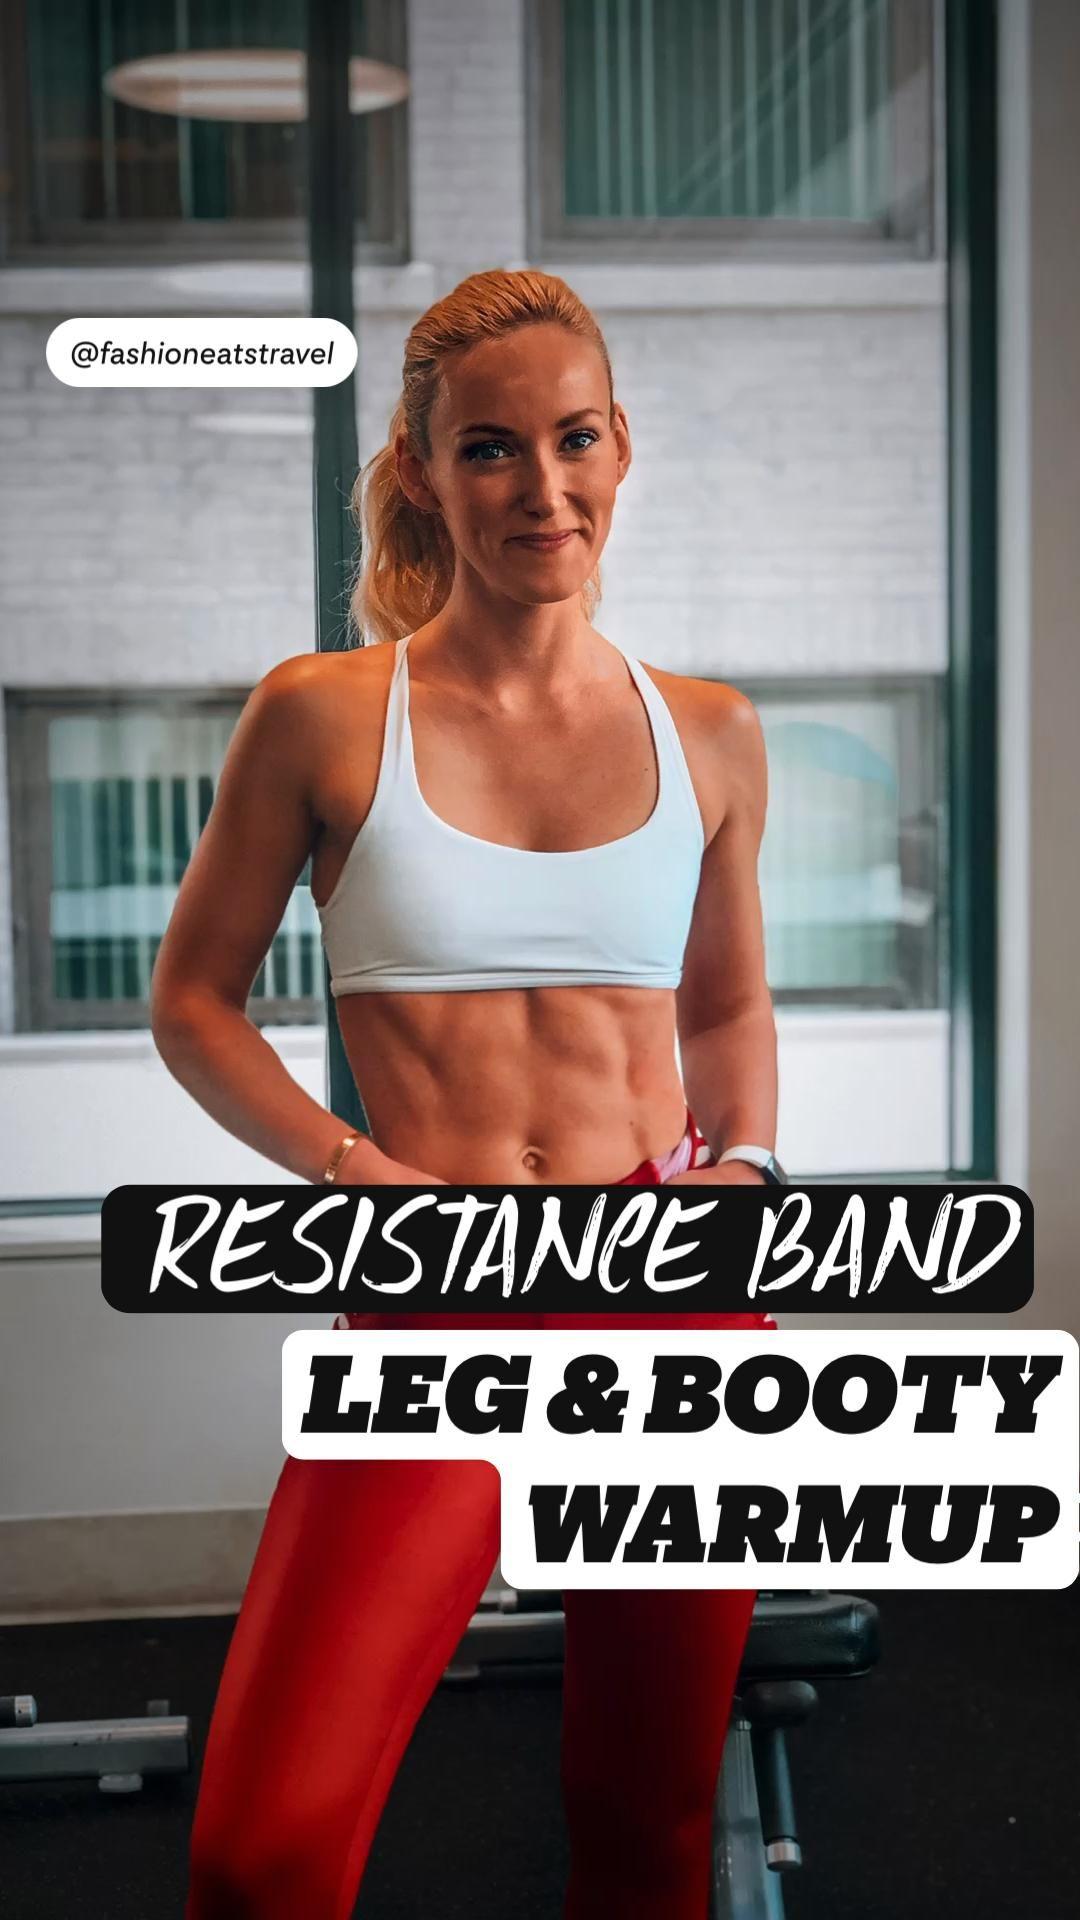 LEG & BOOTY WARMUP